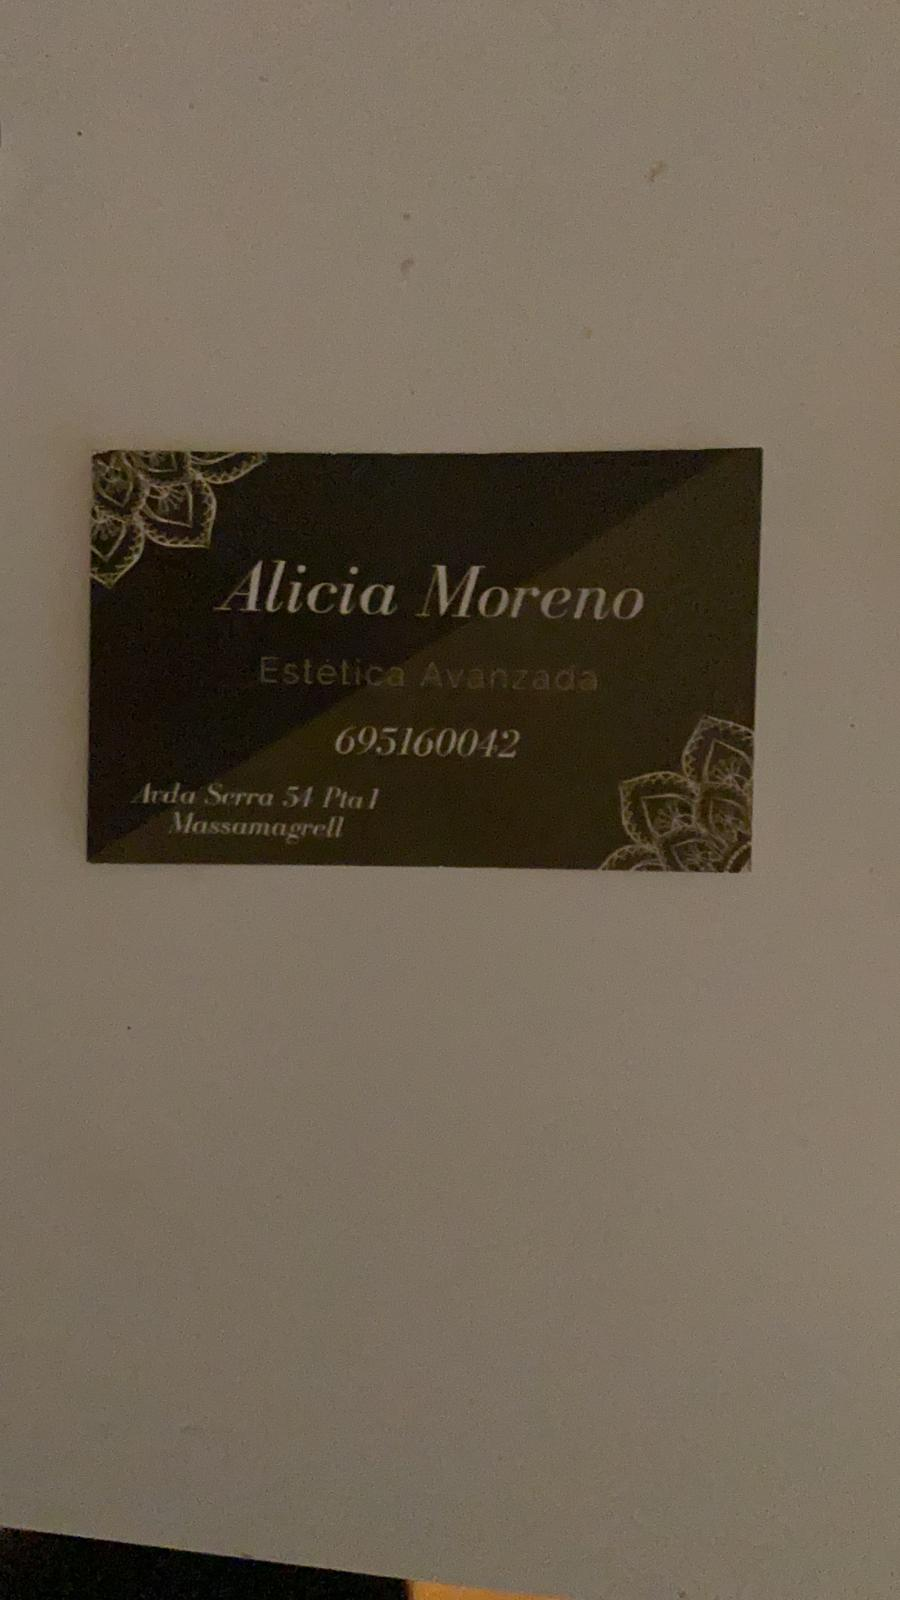 Alicia Moreno Estética